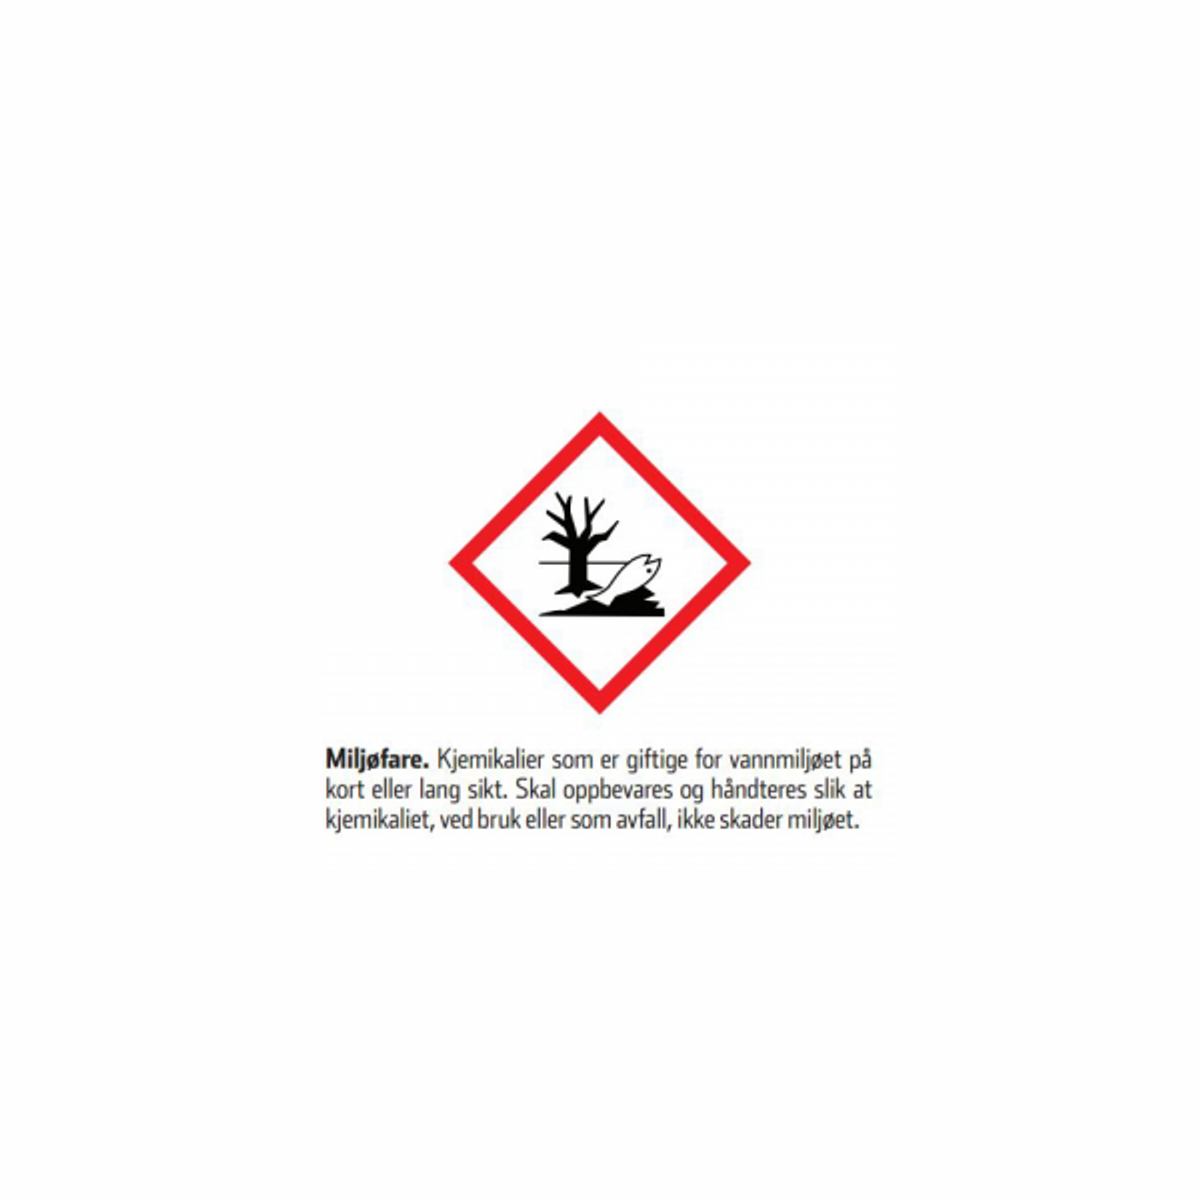 Sram Pitstop 5.1 DOT Hydraluisk olje, 118ml